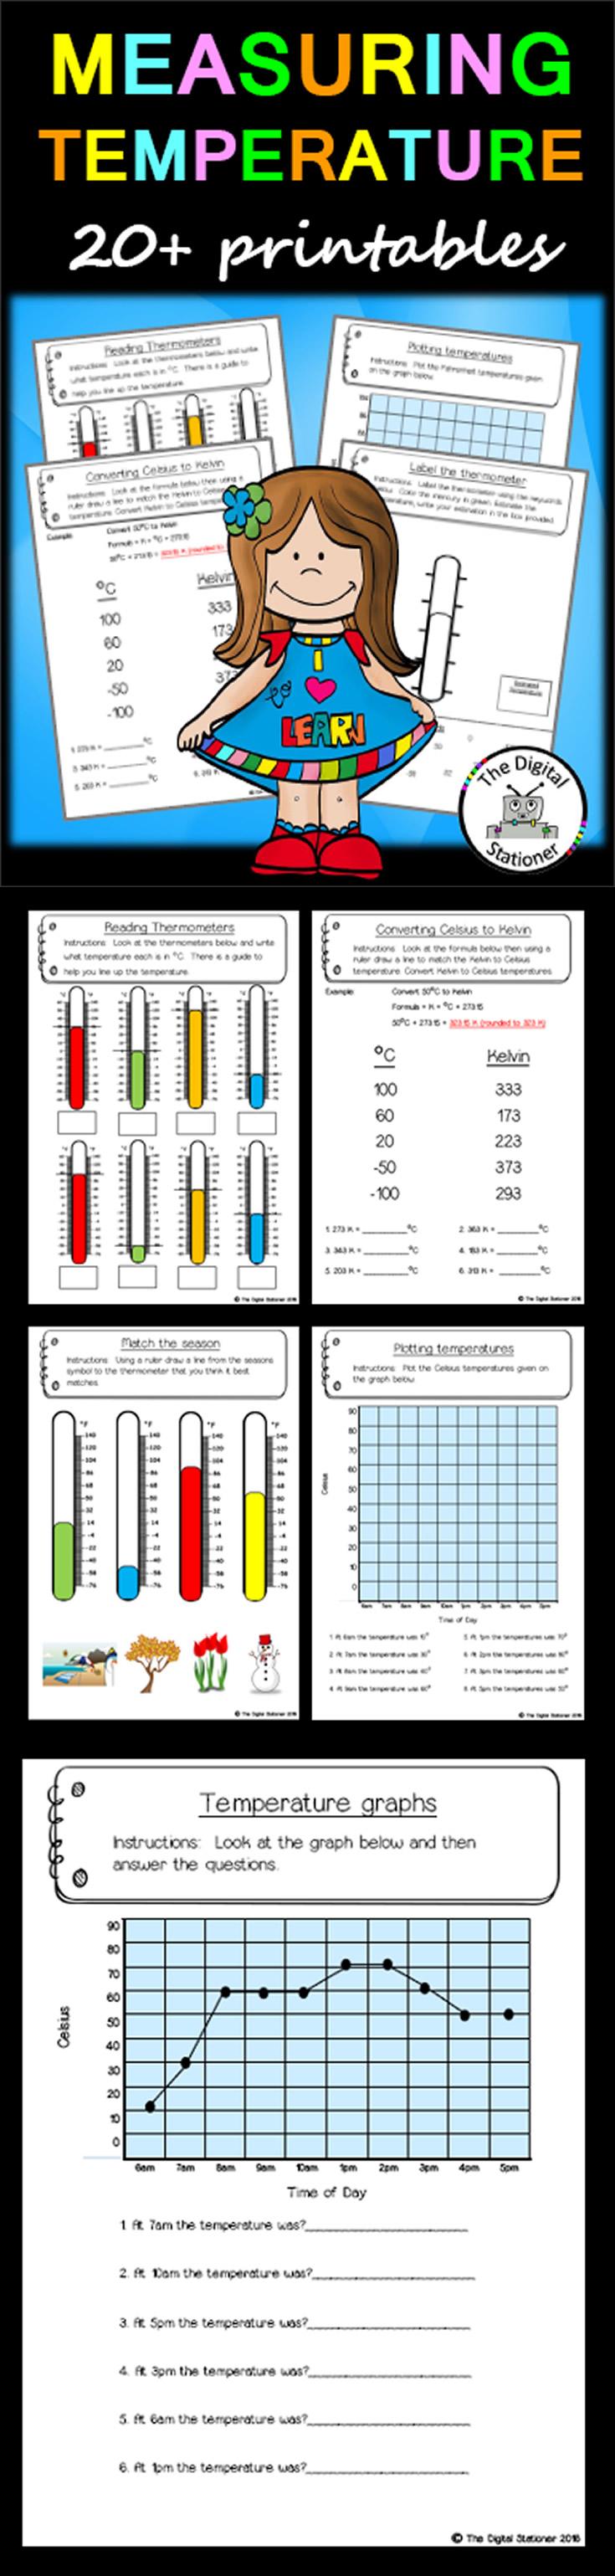 medium resolution of Measuring Temperature – 20+ printables (Measurement \u0026 Data)   Homeschool  programs